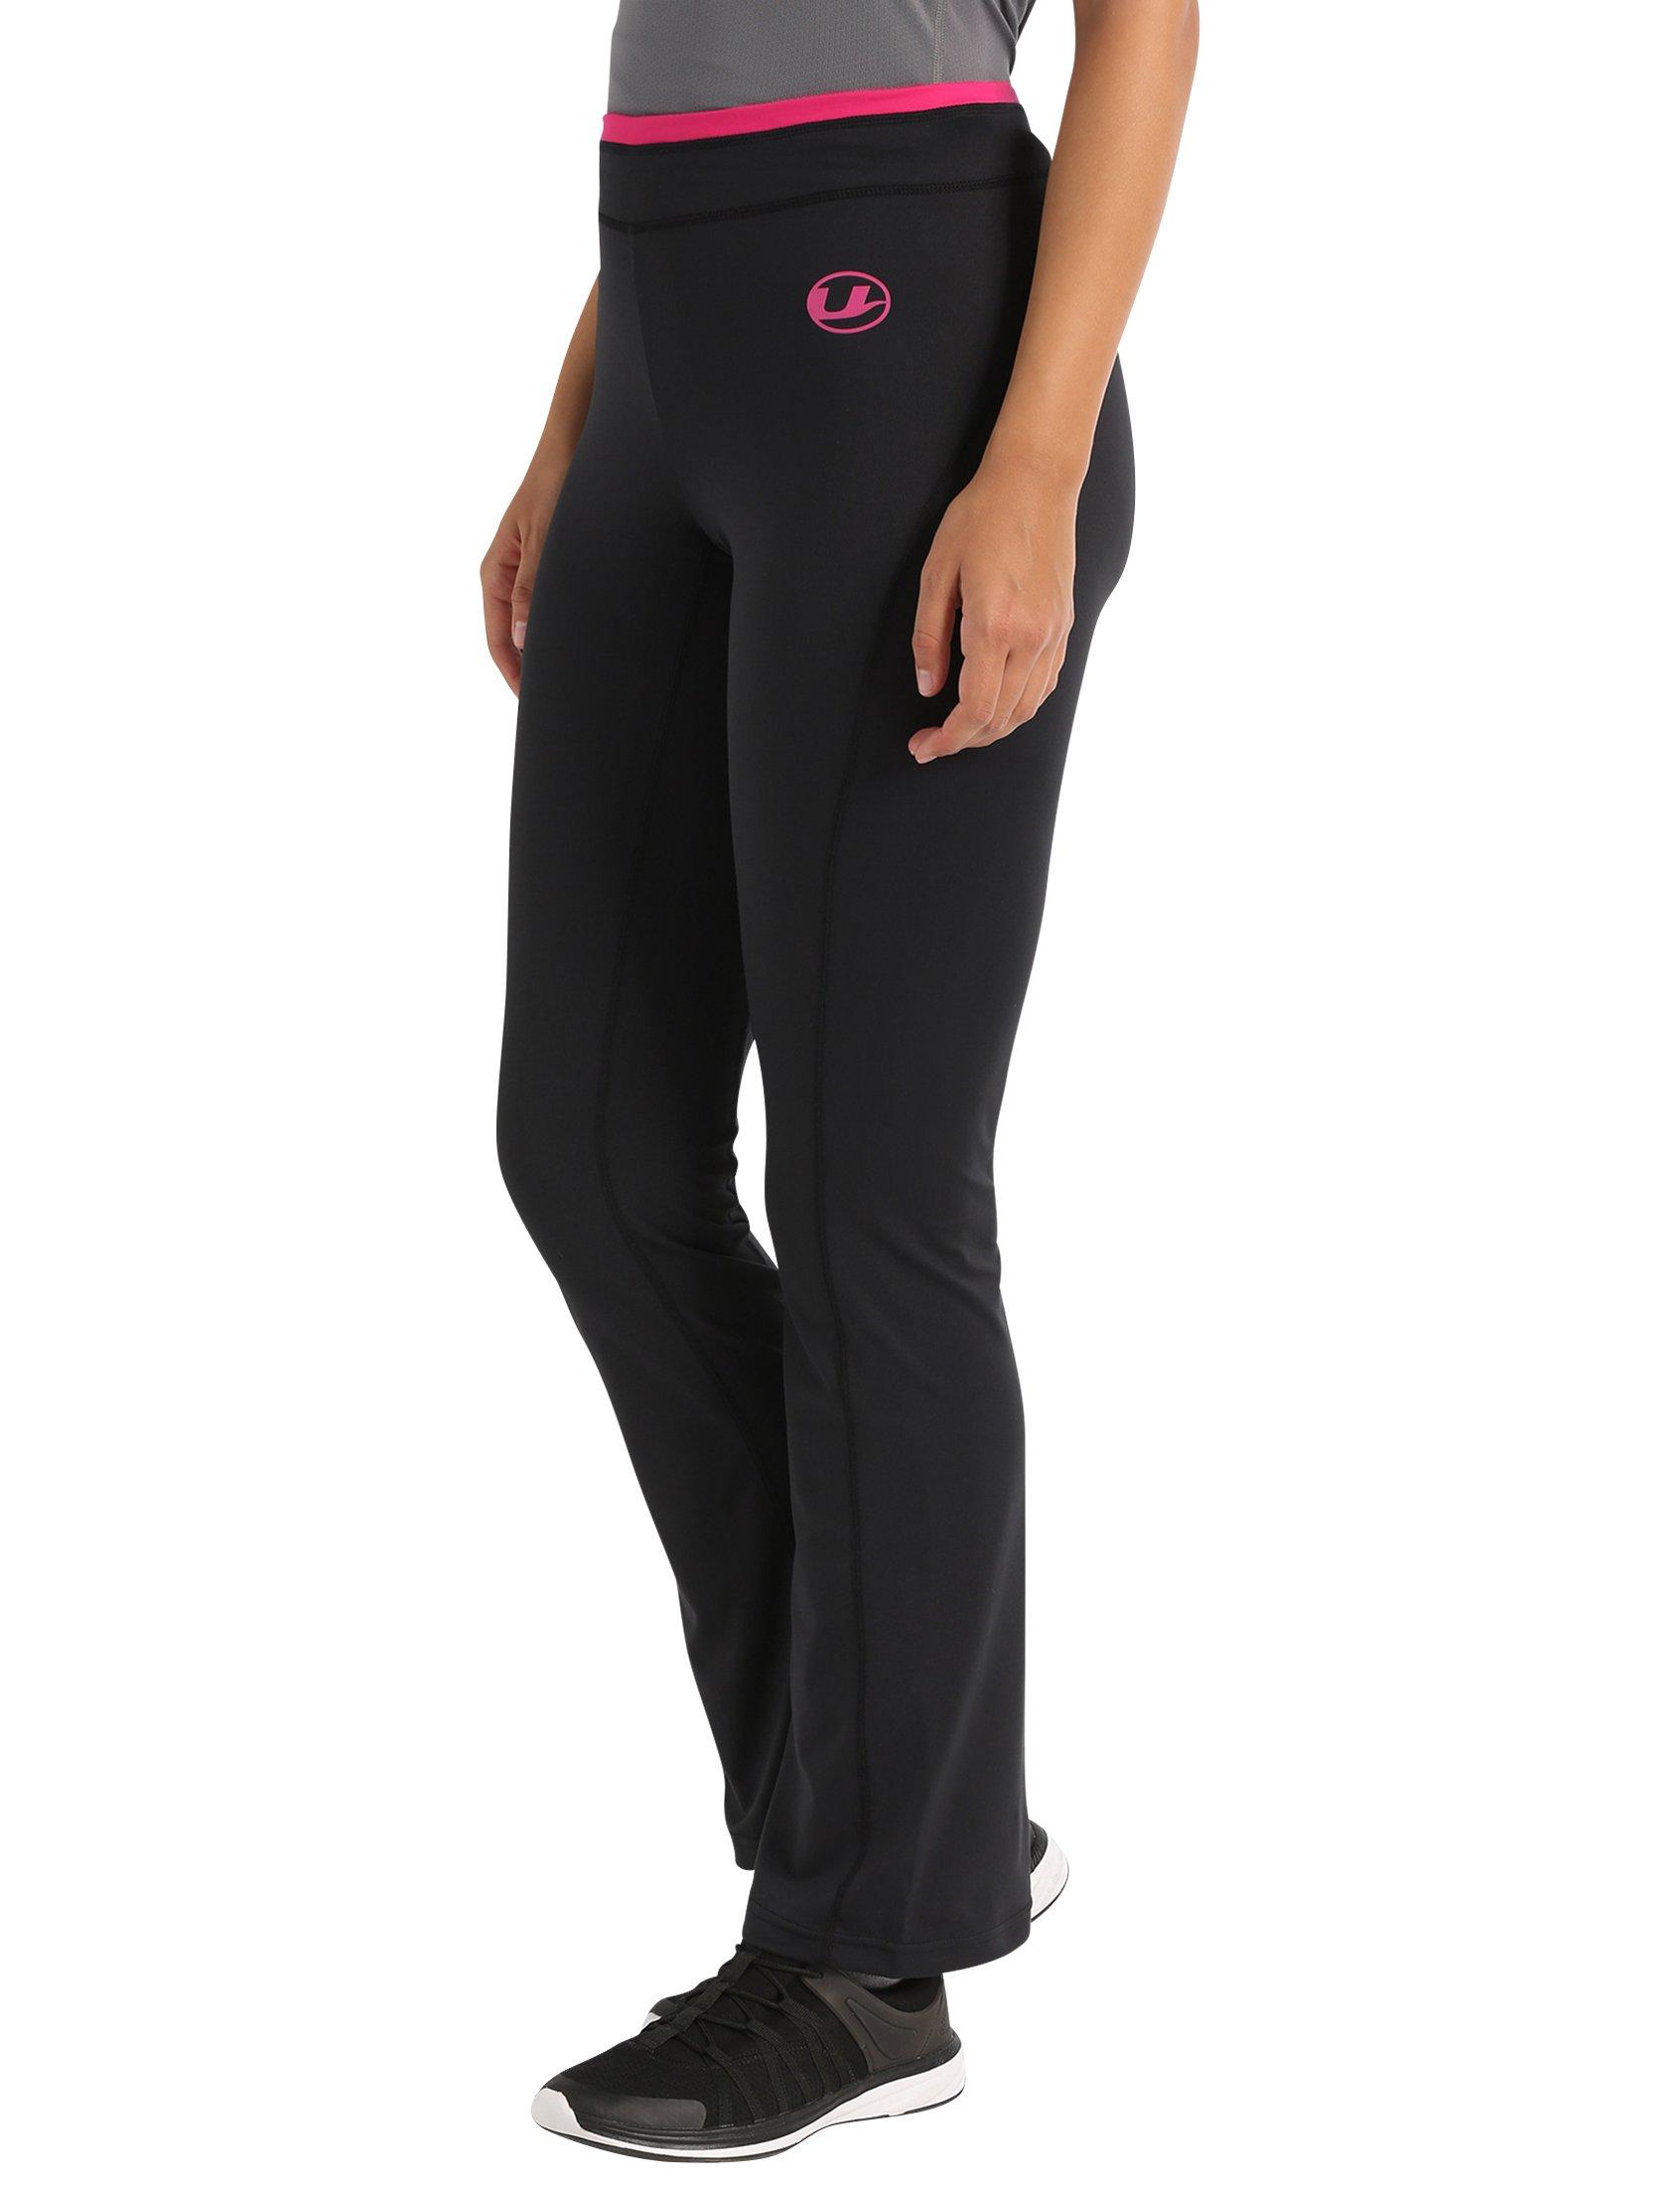 f3ff105fef227 Ultrasport fitness trousers antibacterial and long, ladies jogging ...